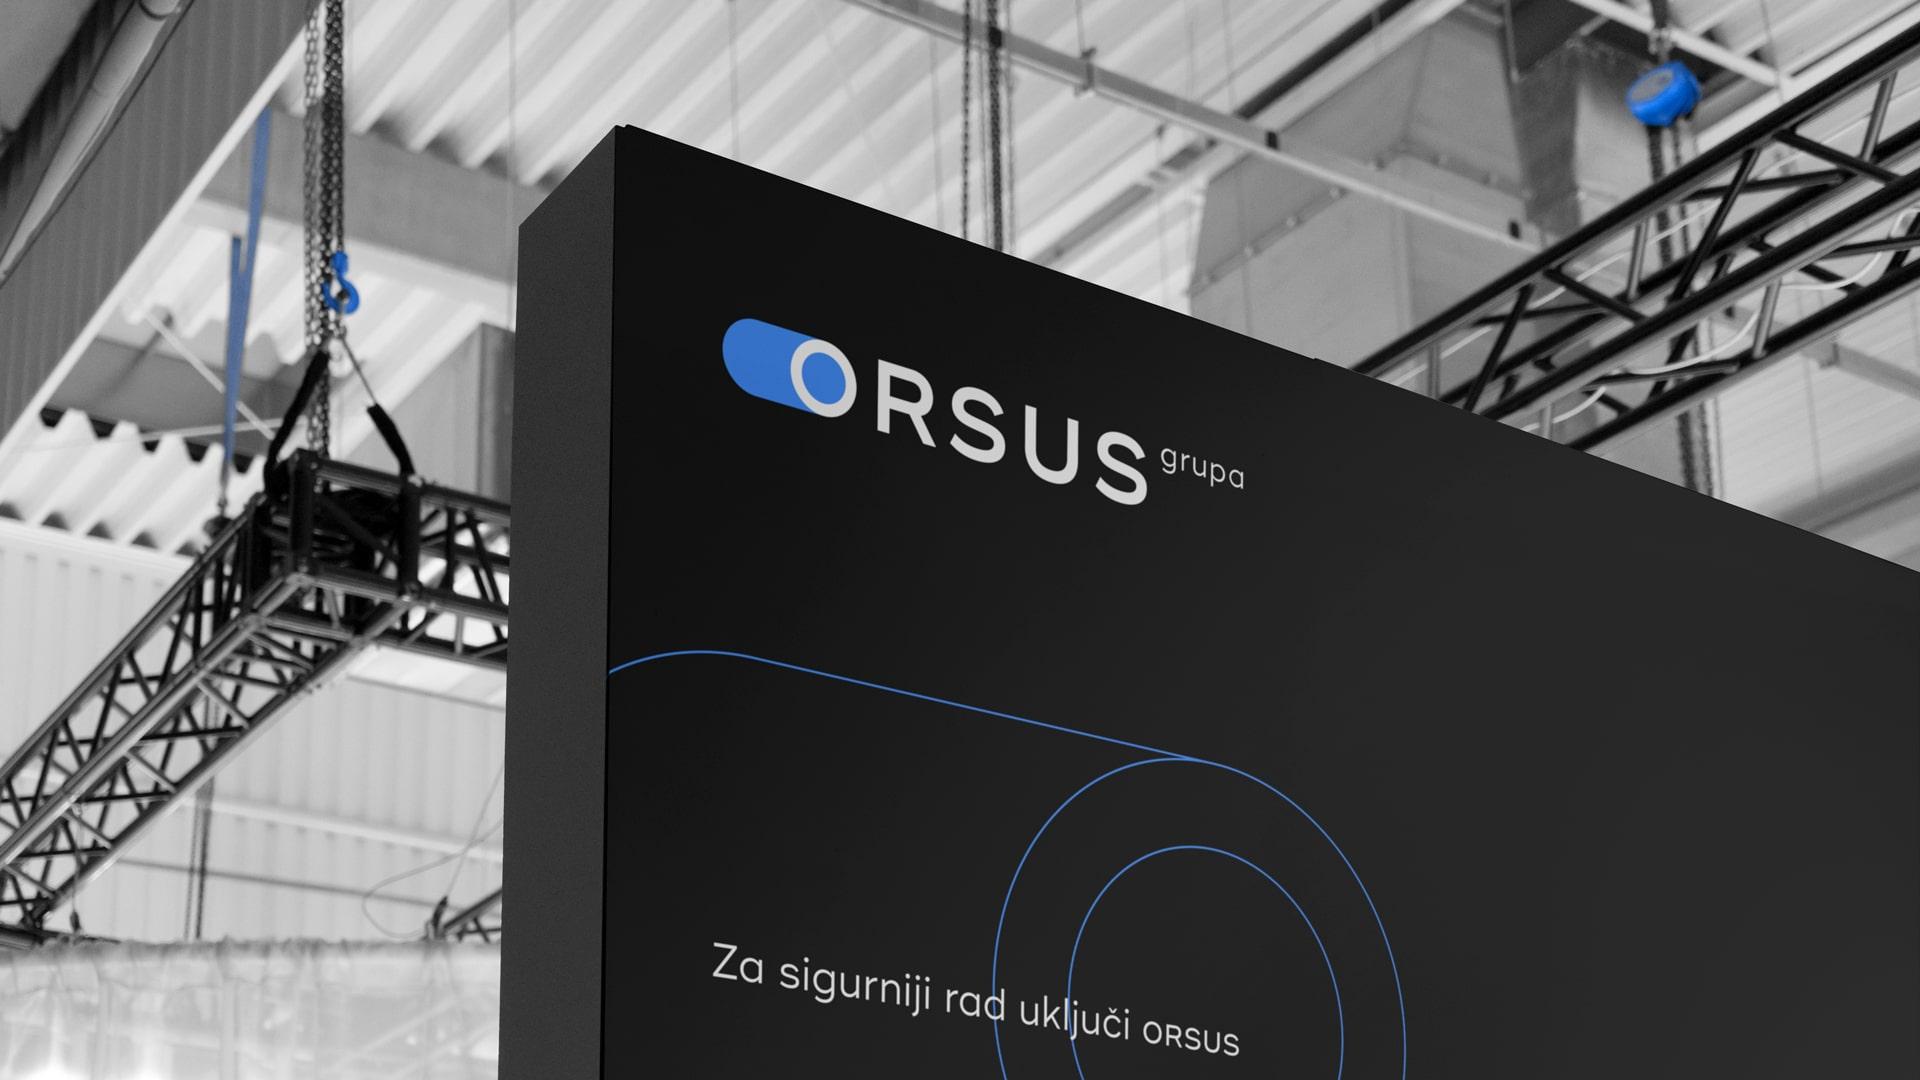 Emtisquare Create the Rebranding for Orsus Grupa